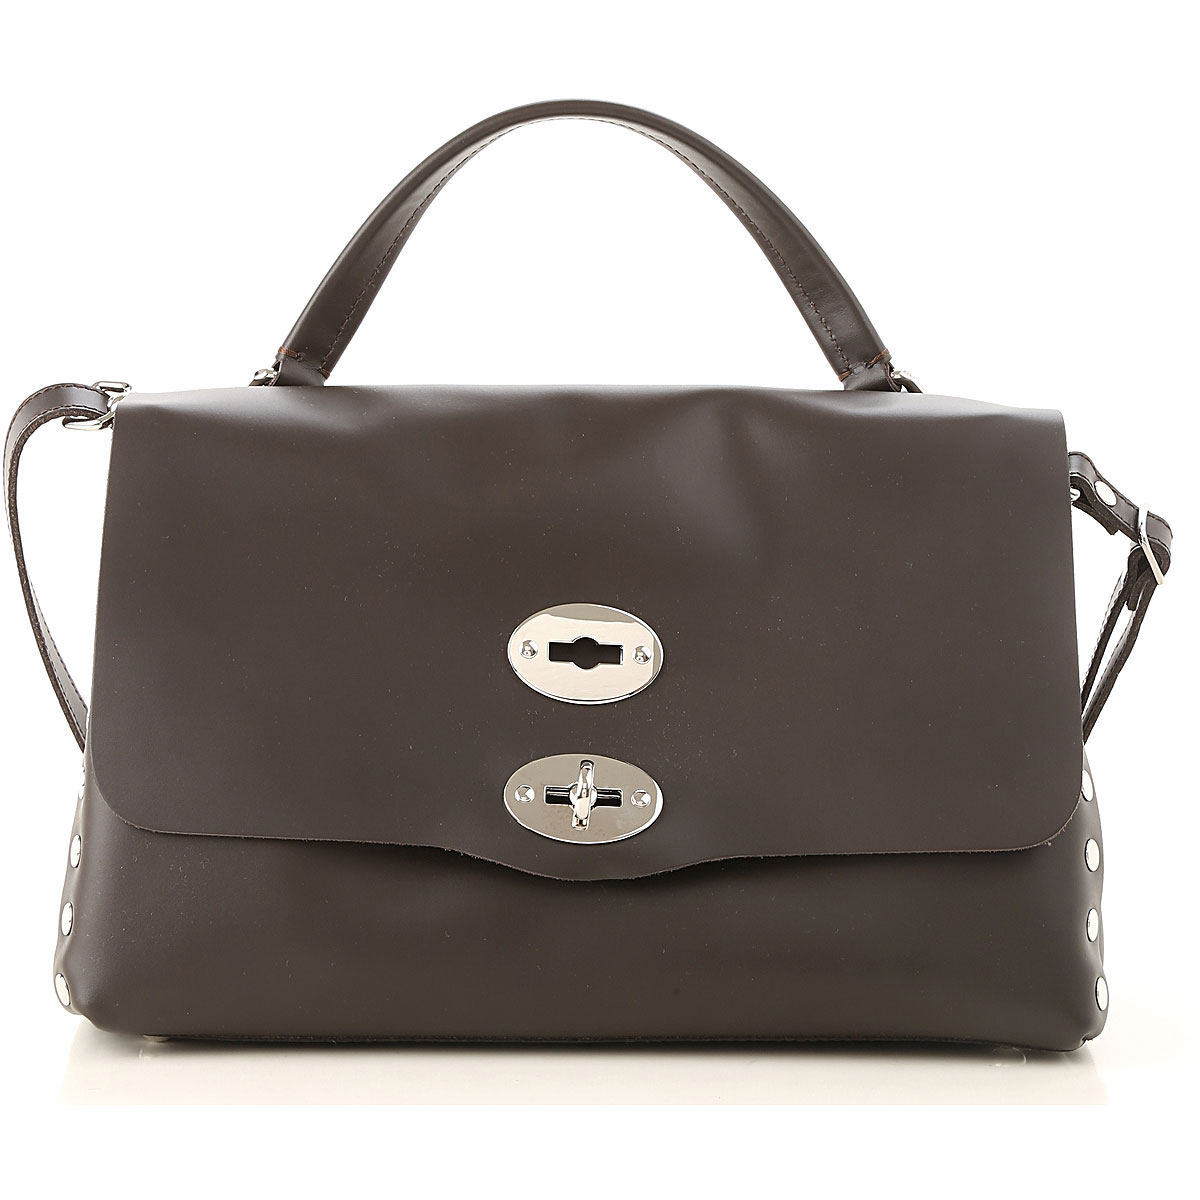 Image of Zanellato Shoulder Bag for Women, Ebony, Leather, 2017